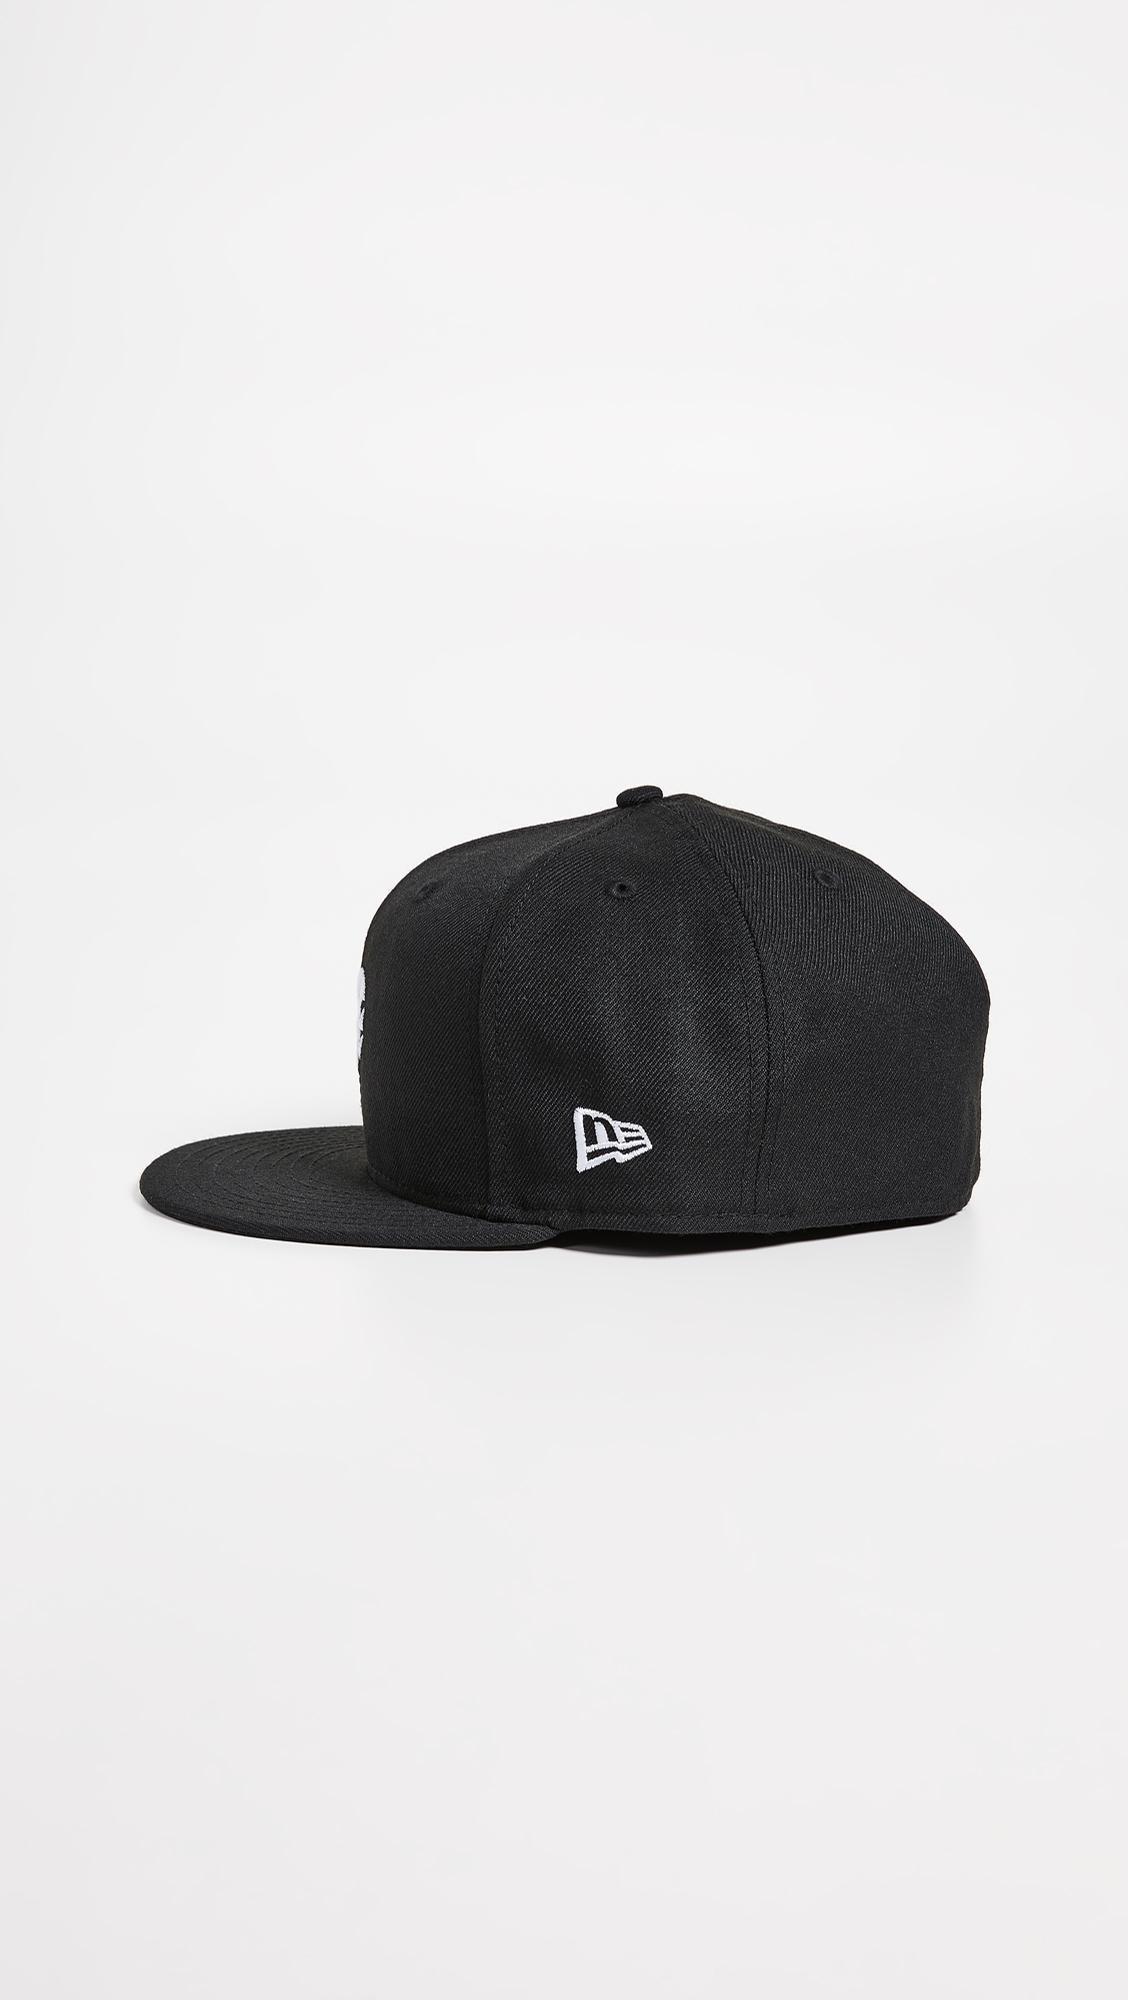 391efcbd3921d Stussy Peace New Era Cap in Black for Men - Lyst